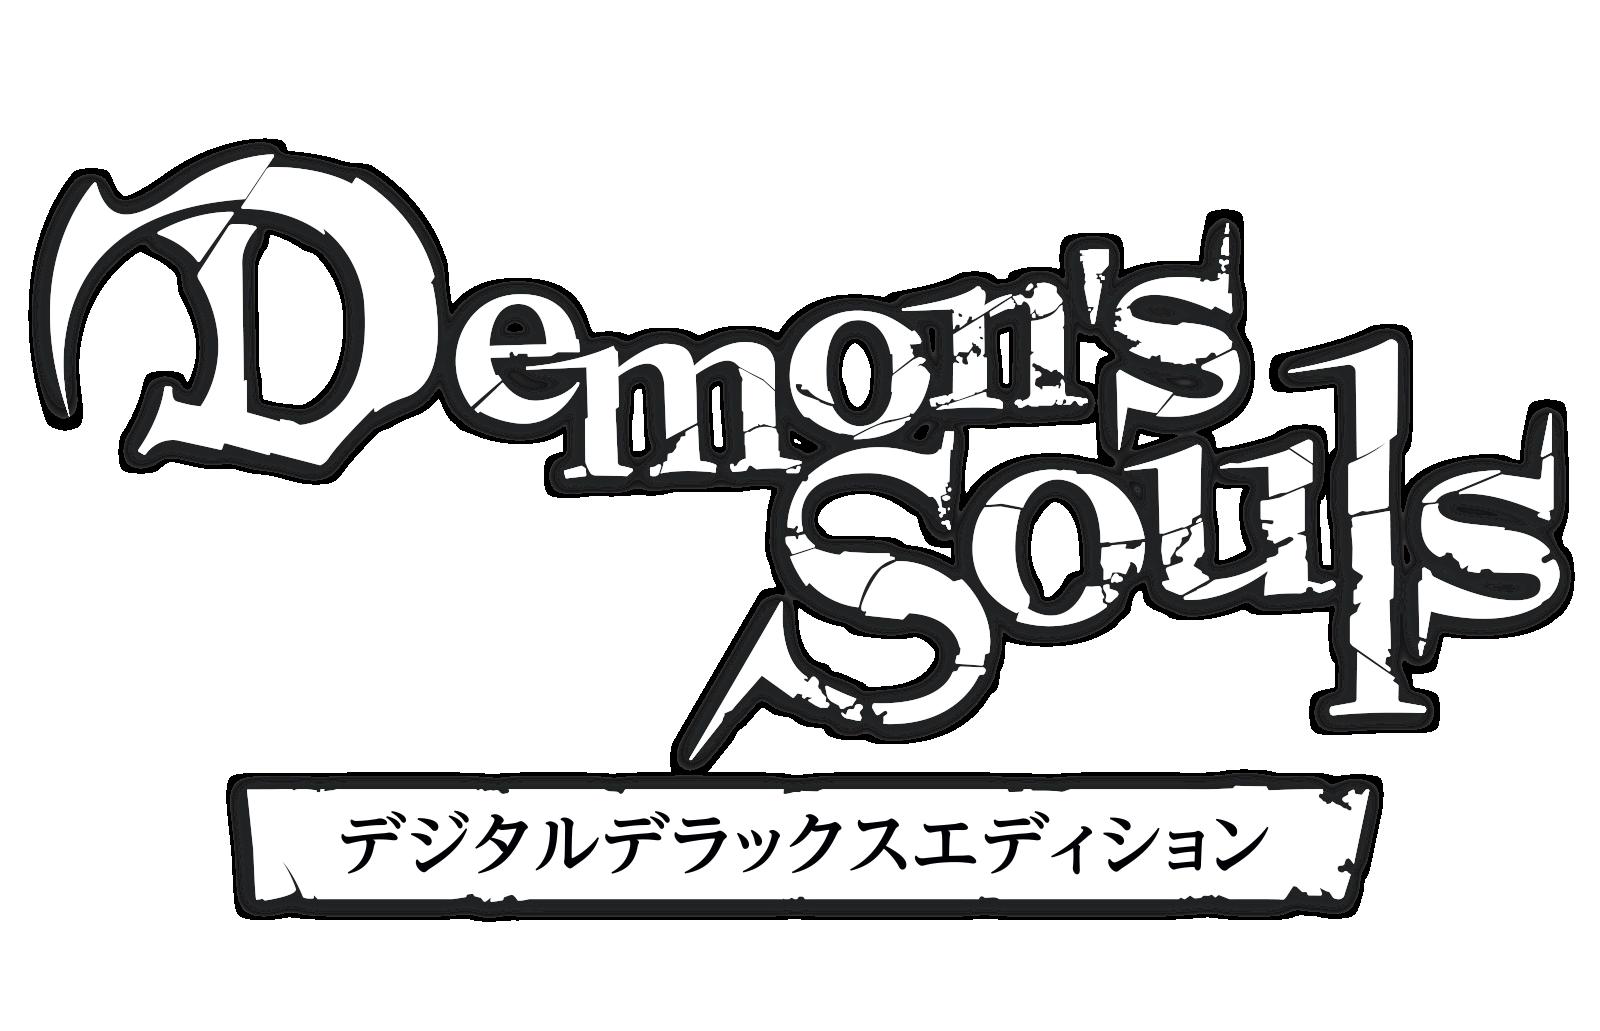 demons souls dde logo